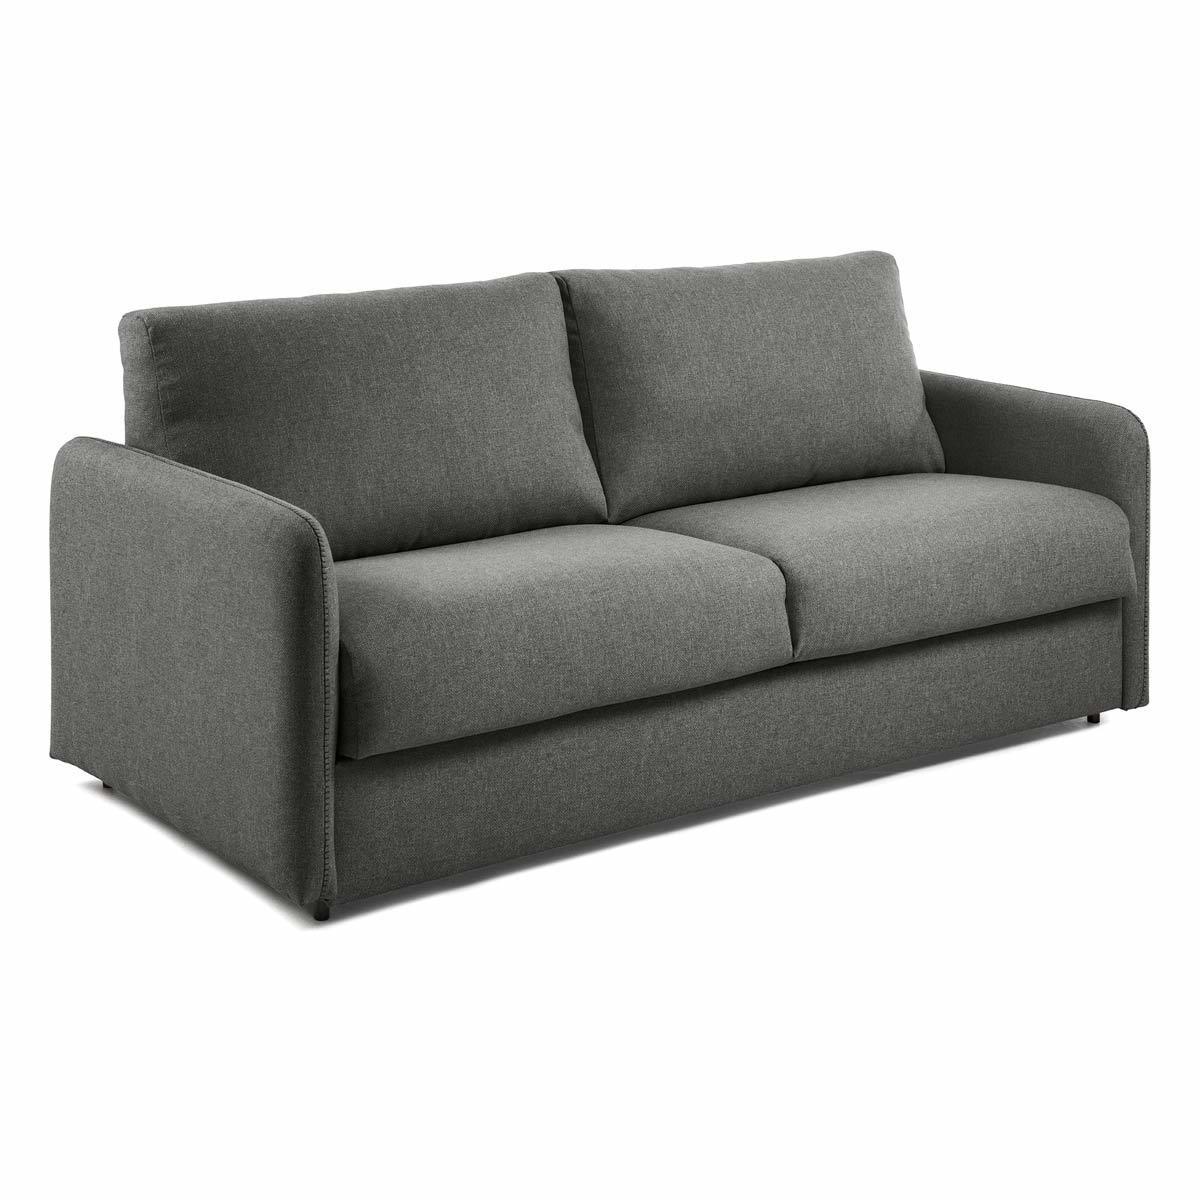 Canapé Lit Convertible Conor En Tissu jR5AL4